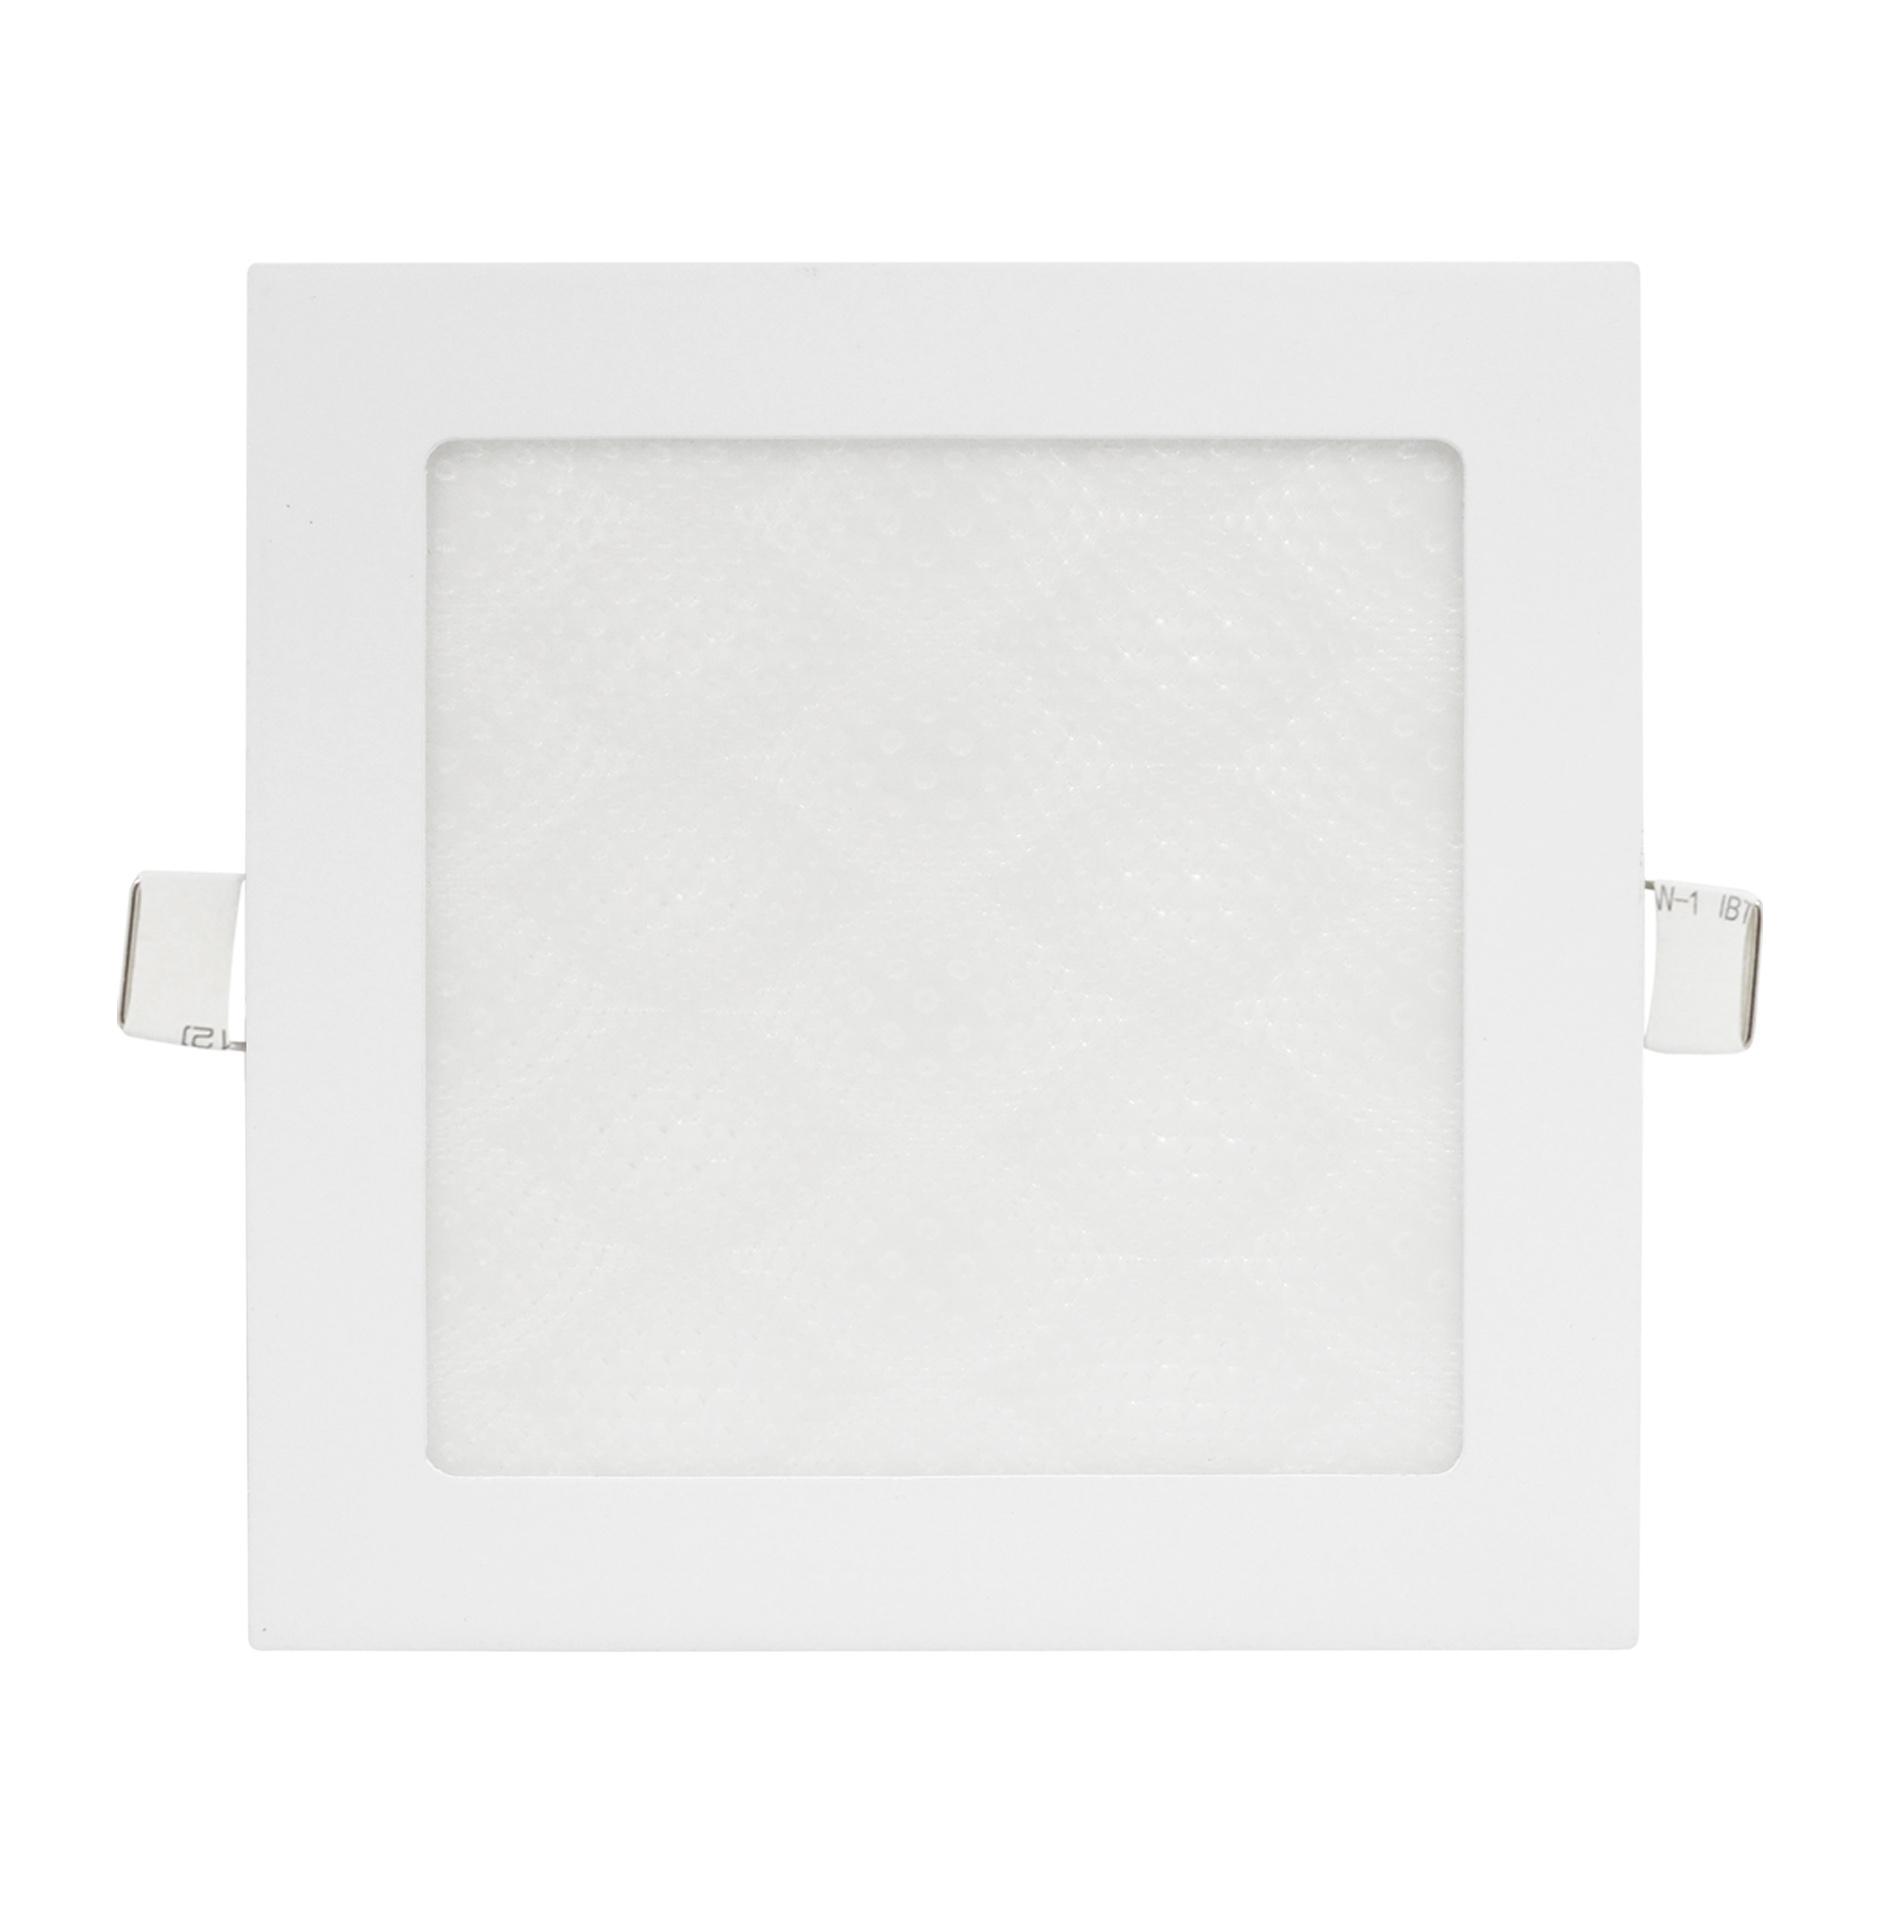 LED Lampu Panel 3D 12 Watt Square White Plafon Rumah Kantor Terang